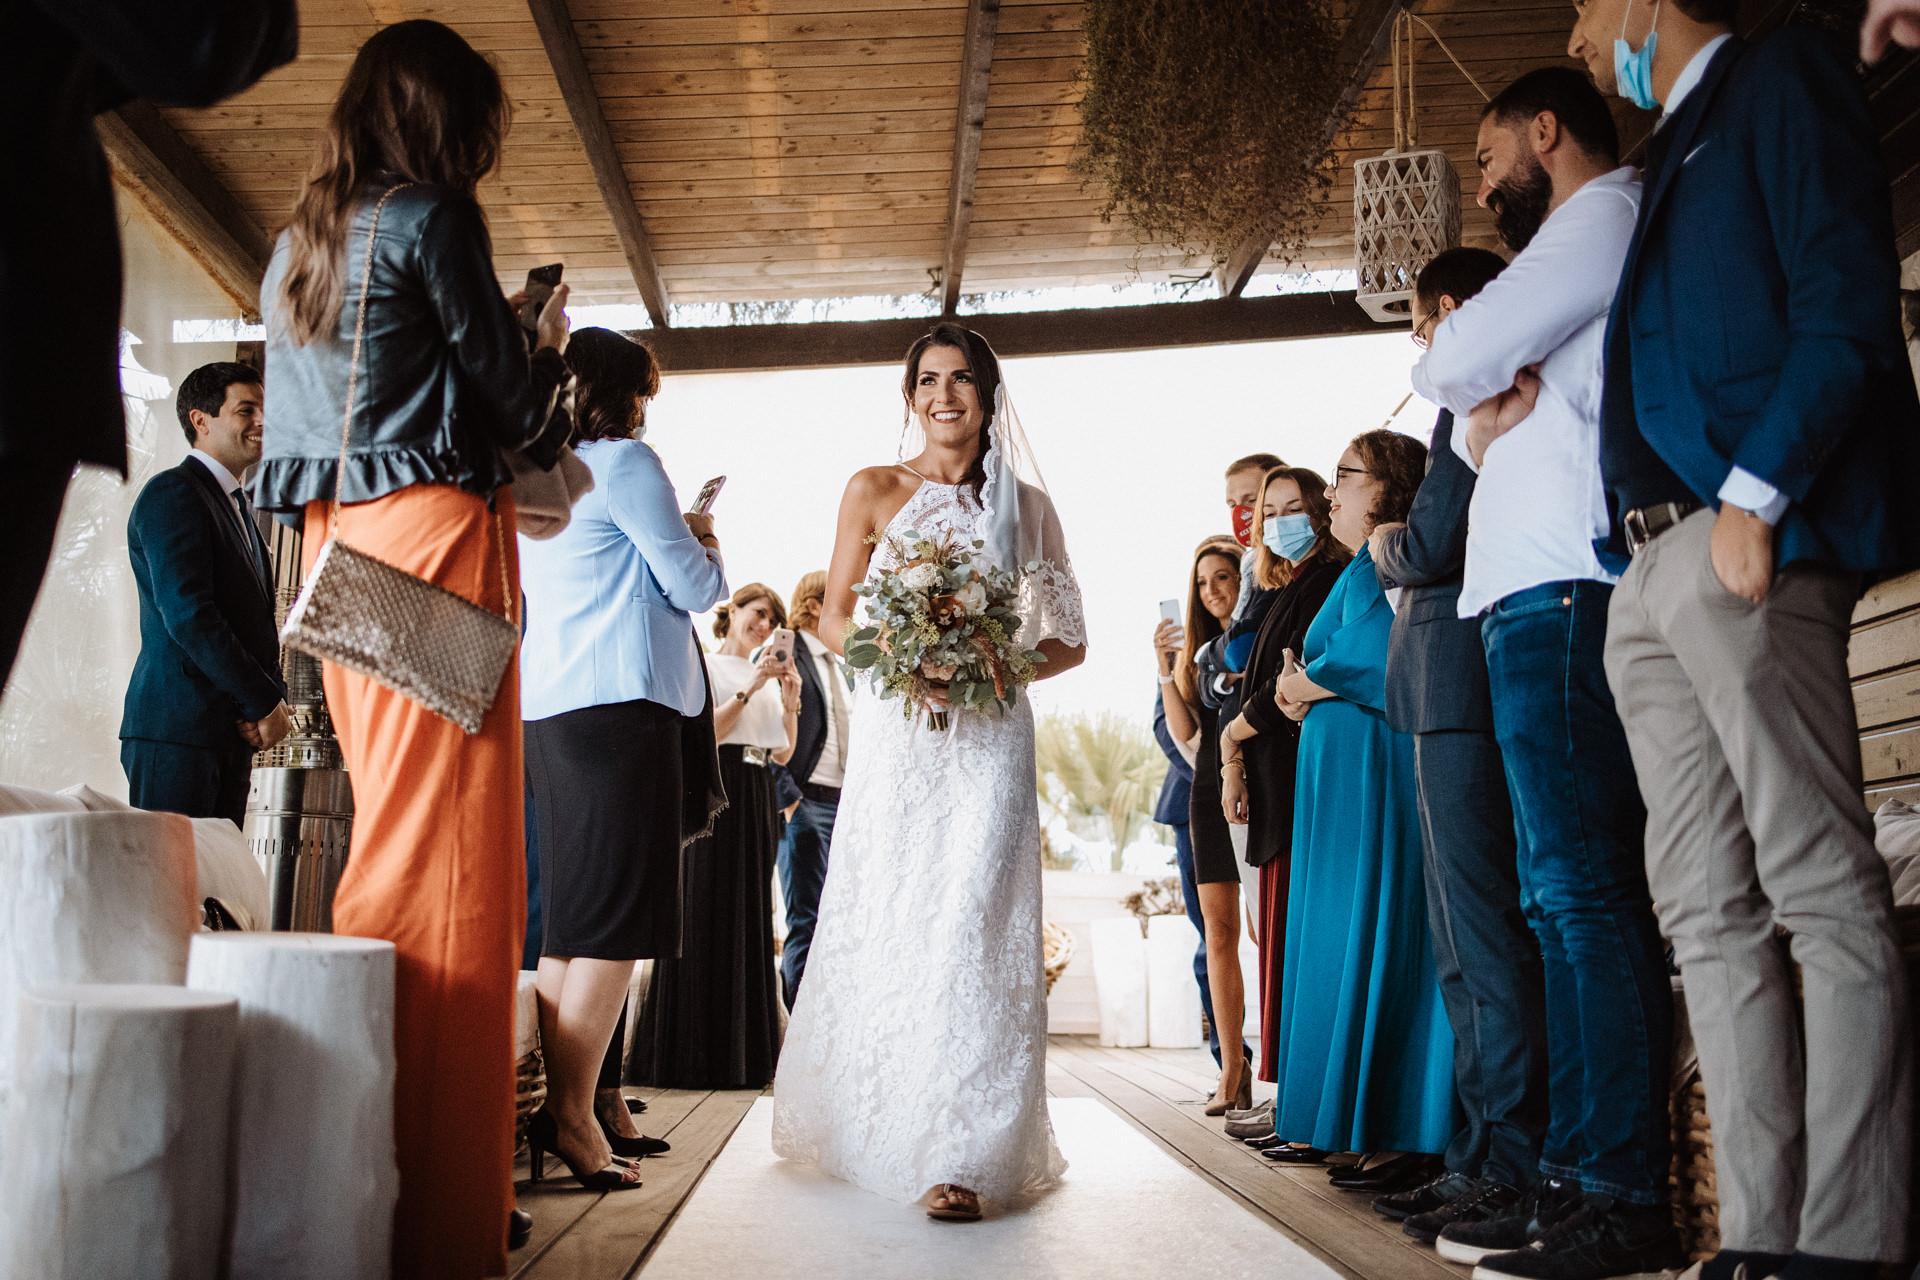 Fiumara Beach Grosseto, Italy Wedding Photos | The bride walks down the aisle with confidence